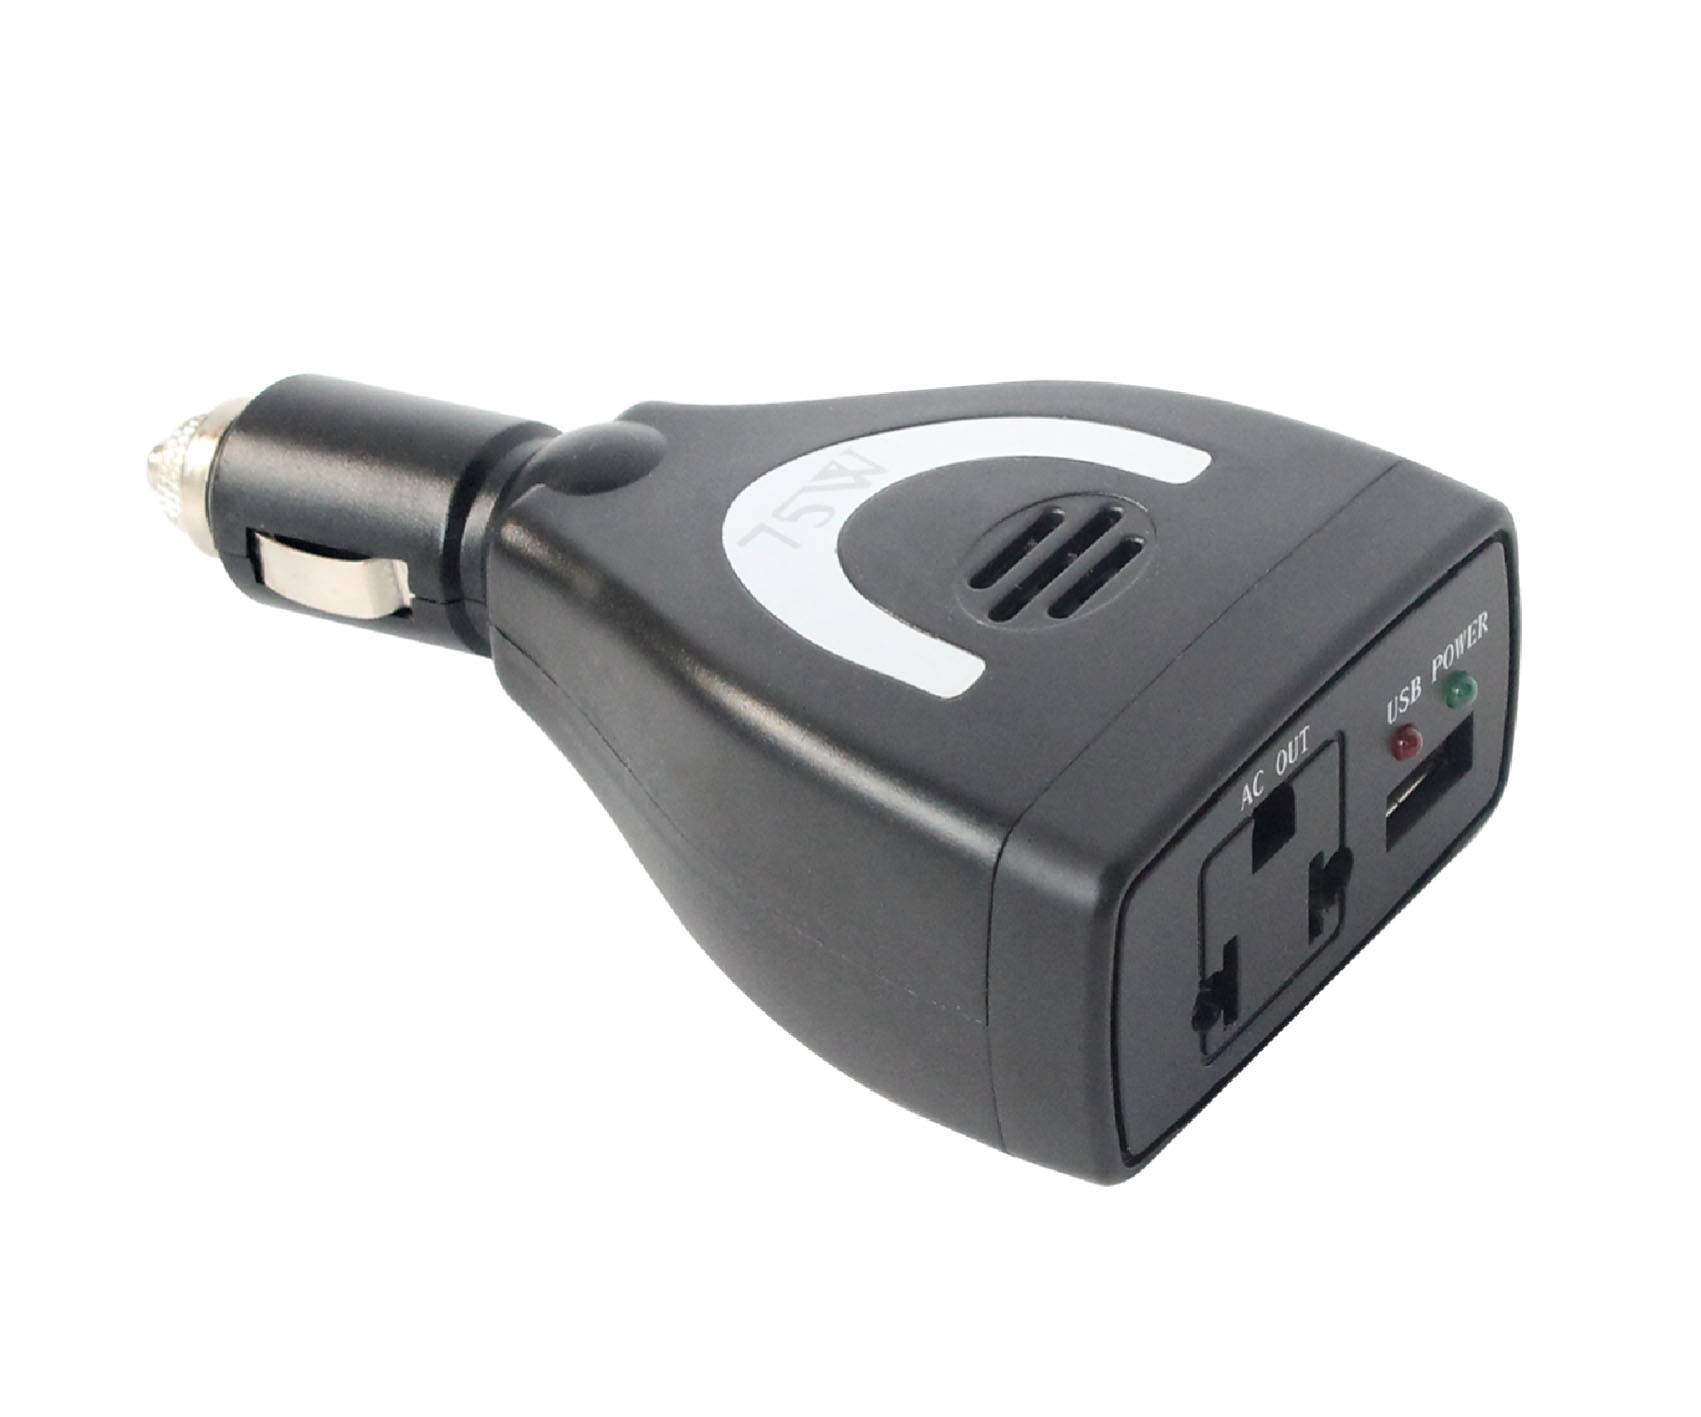 75W sine wave power inverter for car